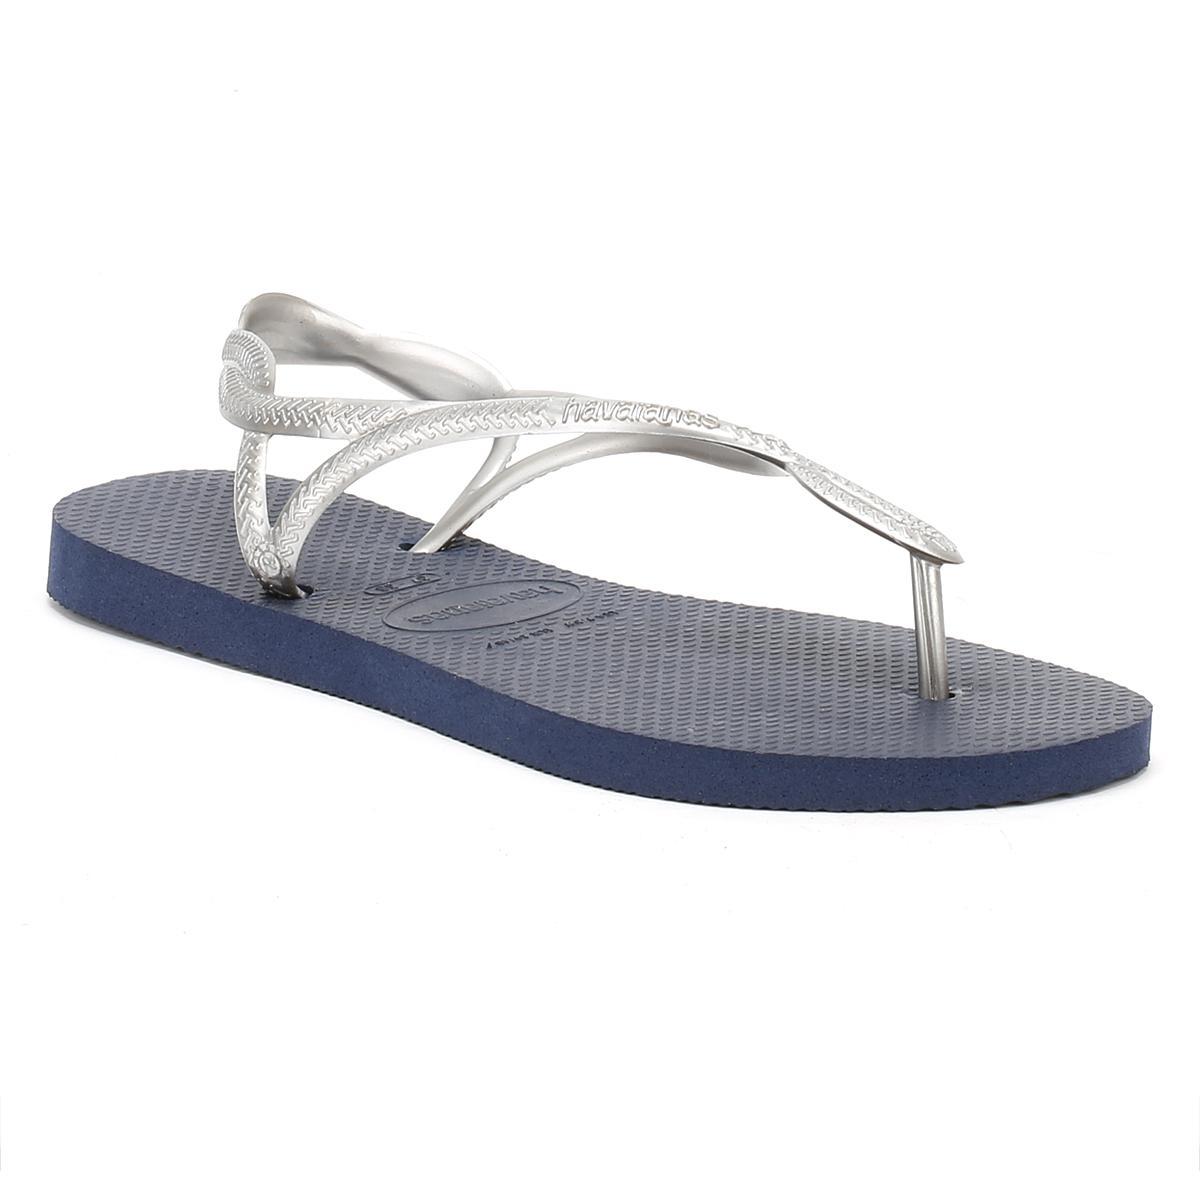 181681fbb608 Lyst - Havaianas Womens Navy silver Luna Sandals in Blue